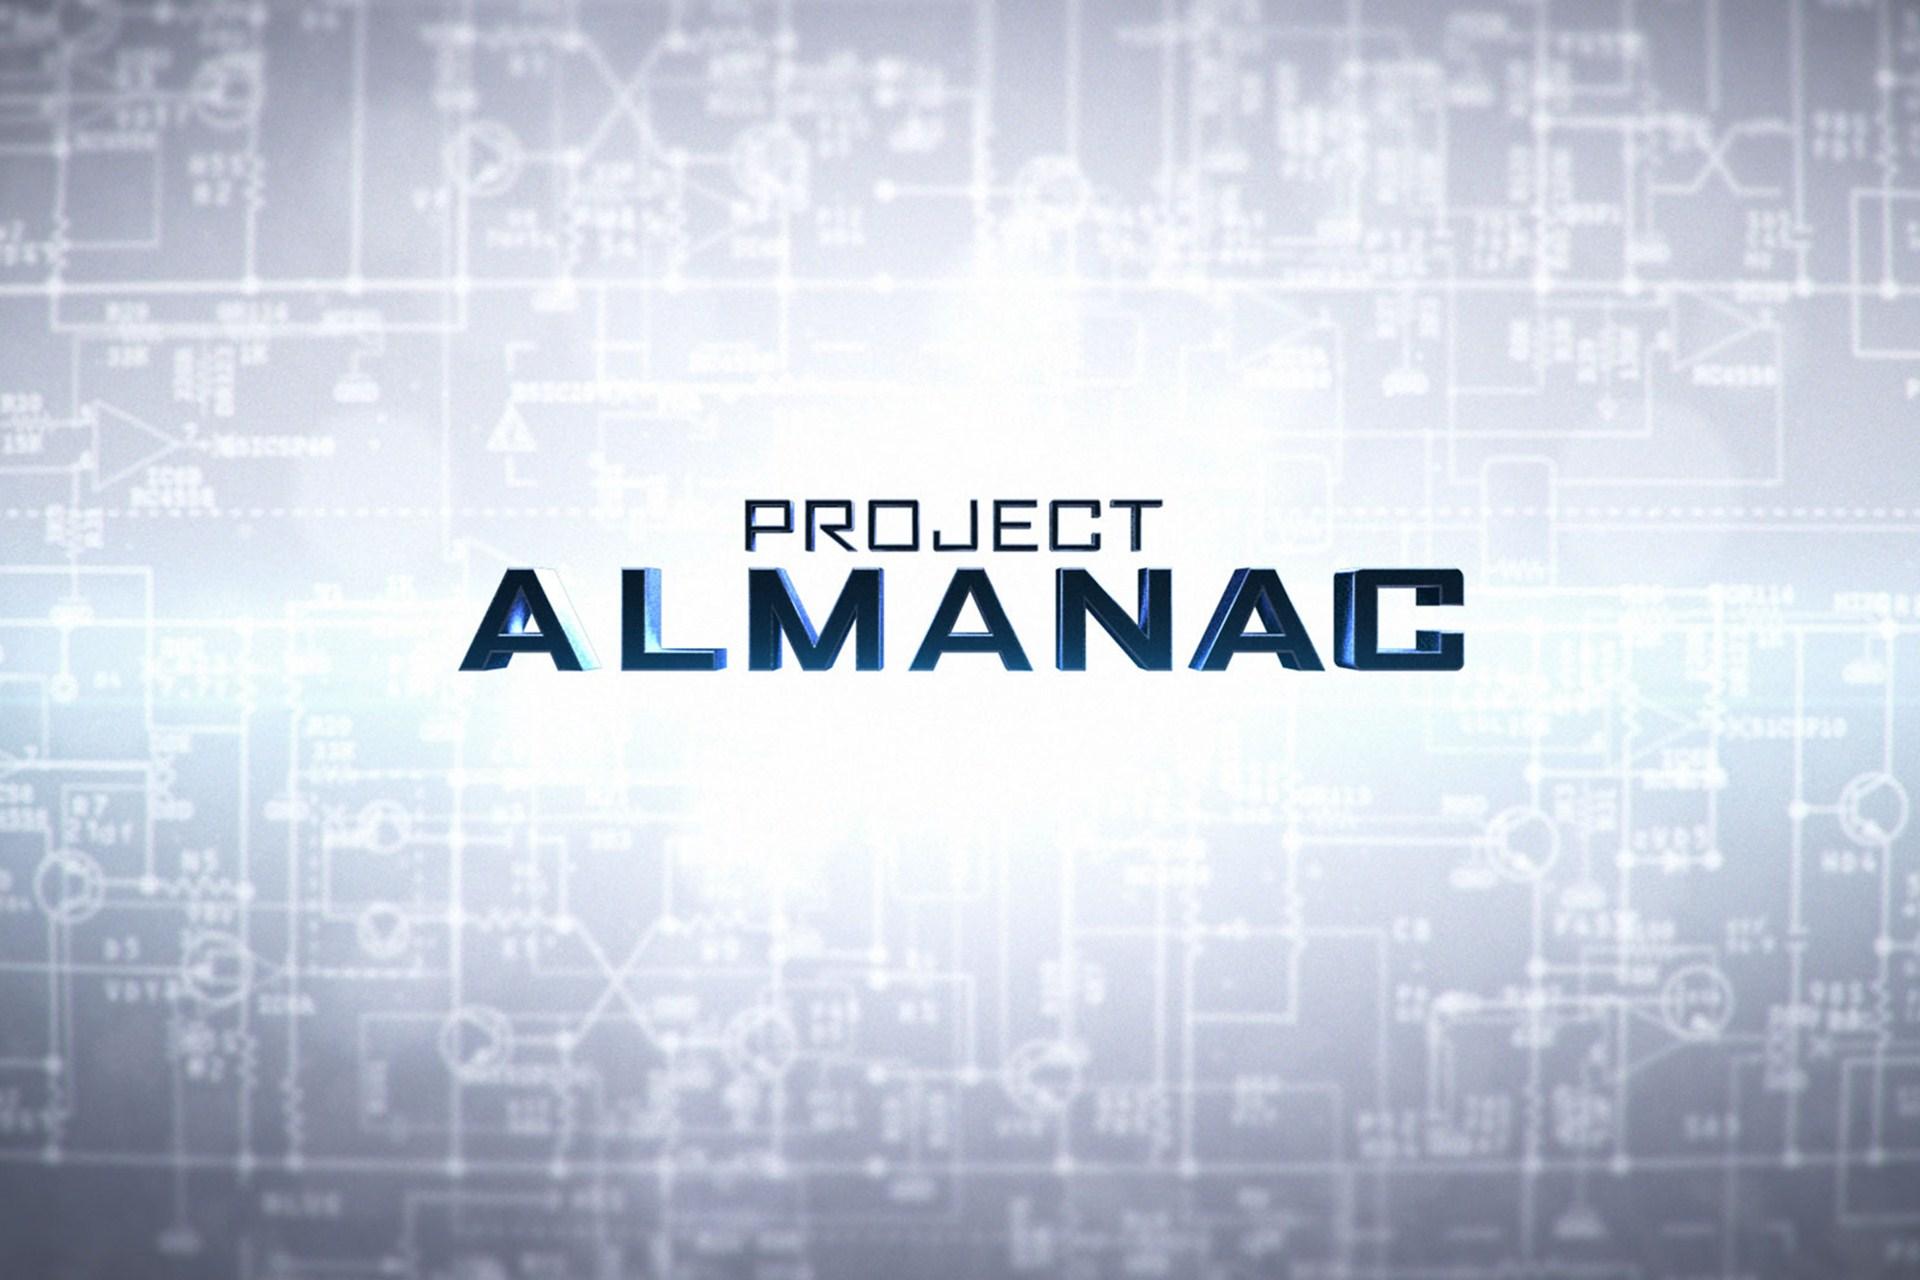 Project-Almanac-2015-Poster-Wallpapers.jpg